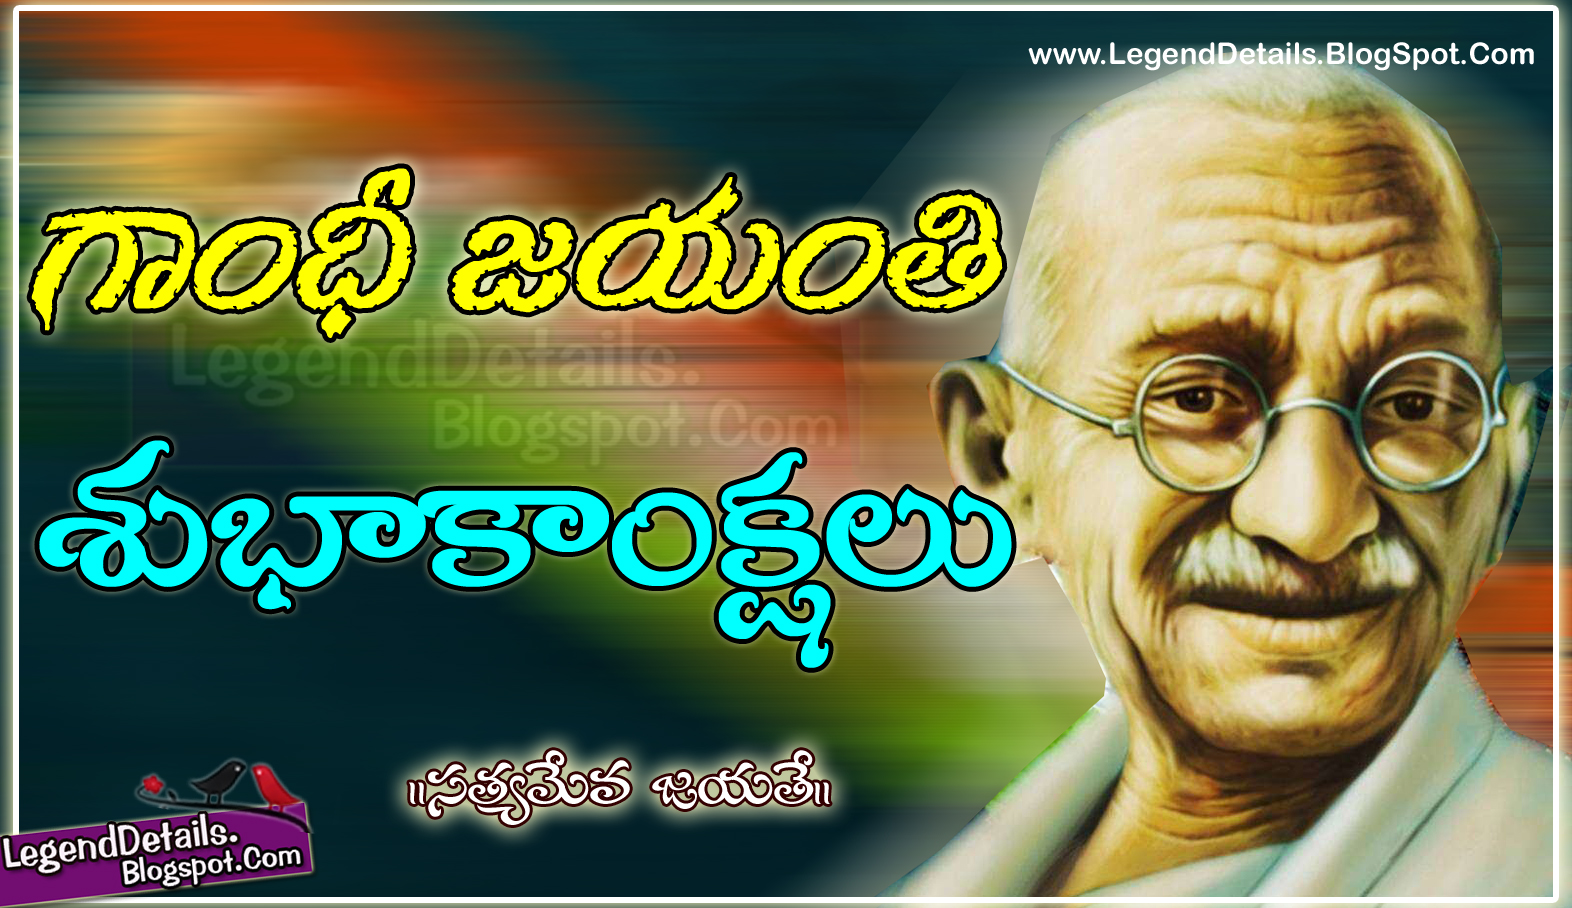 Mahatma Gandhi Jayanti Wishes Greetings In Telugu Language